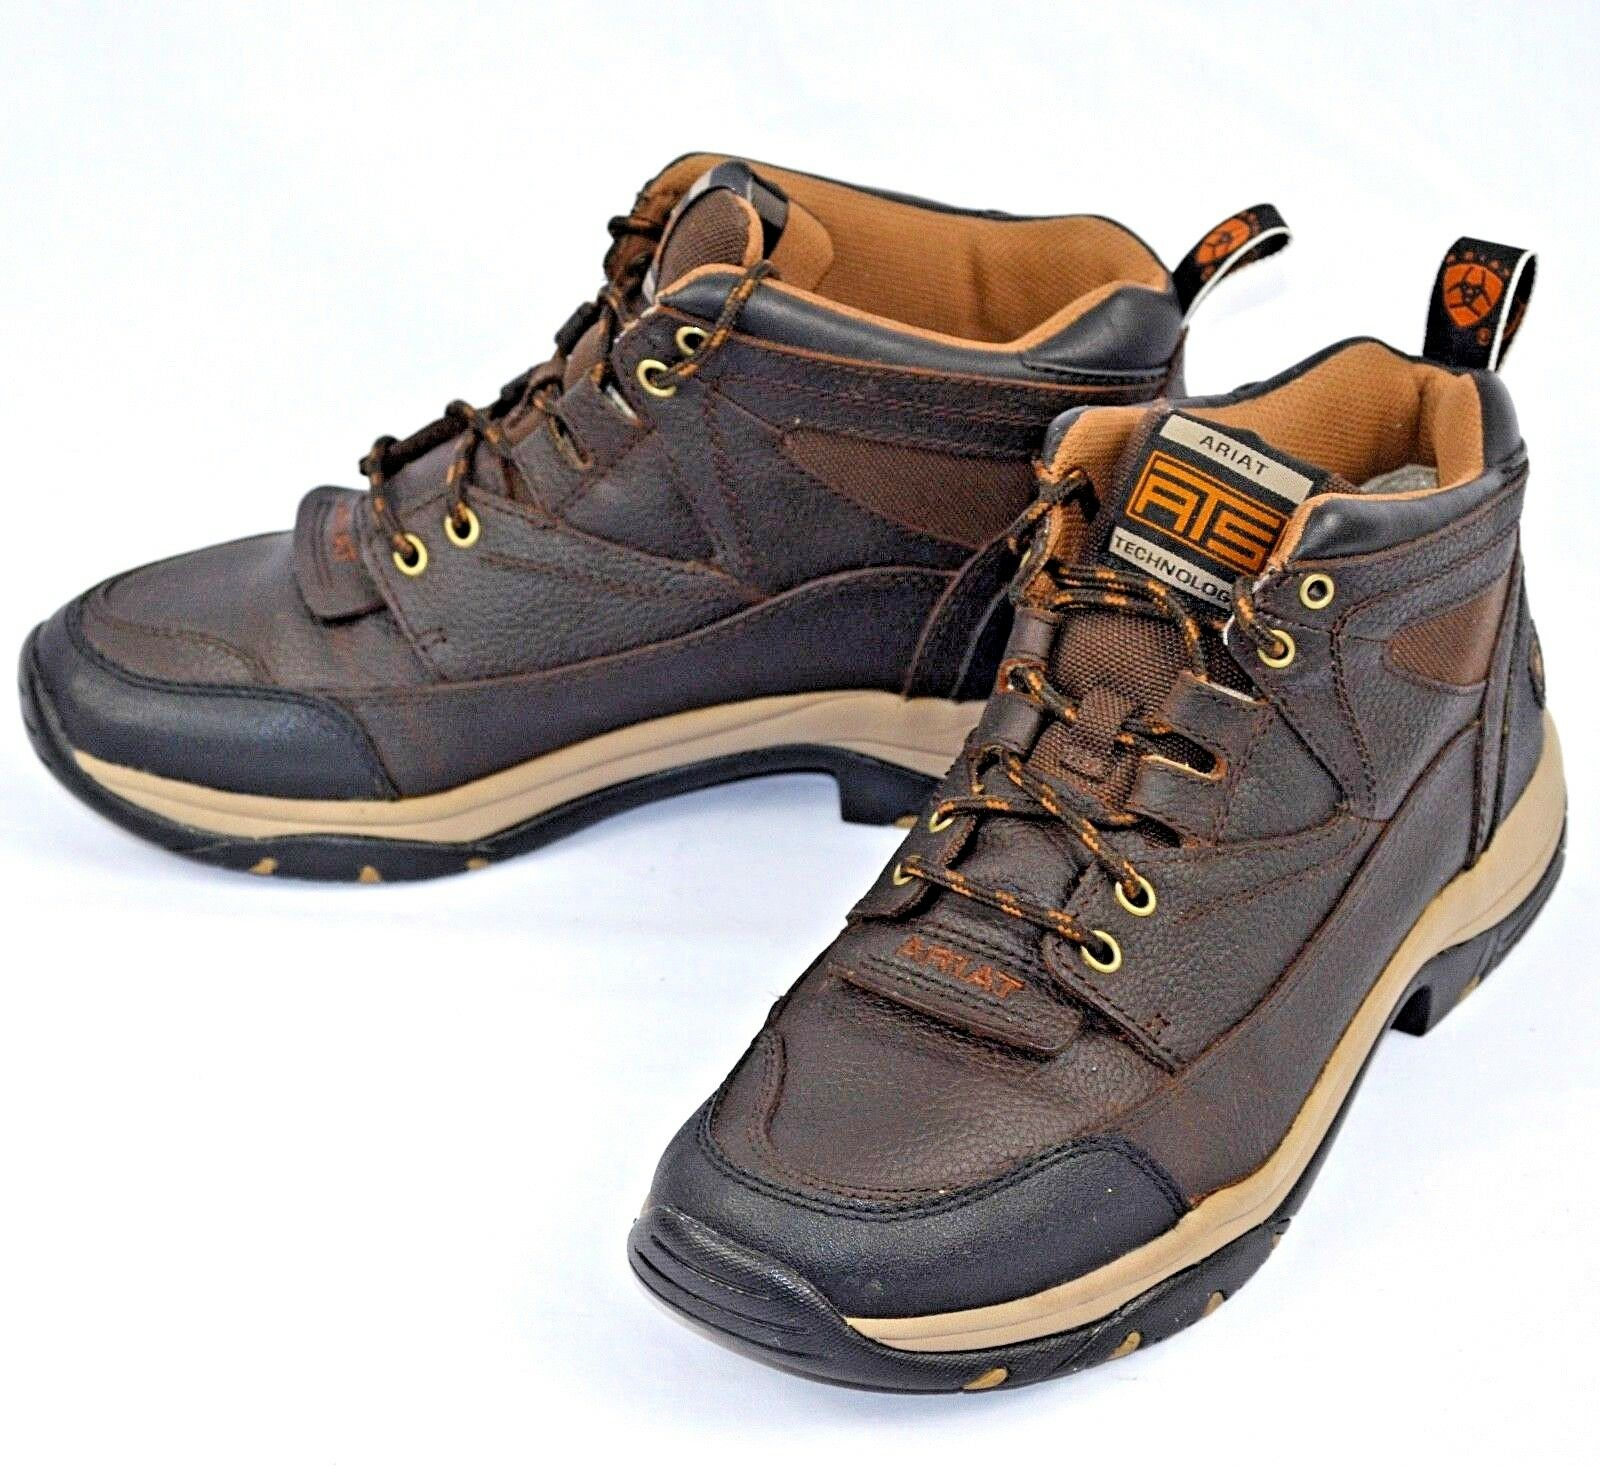 Ariat Uomo Terrain Work Stivali Hiking Stivali Brown Pelle Sz 9D